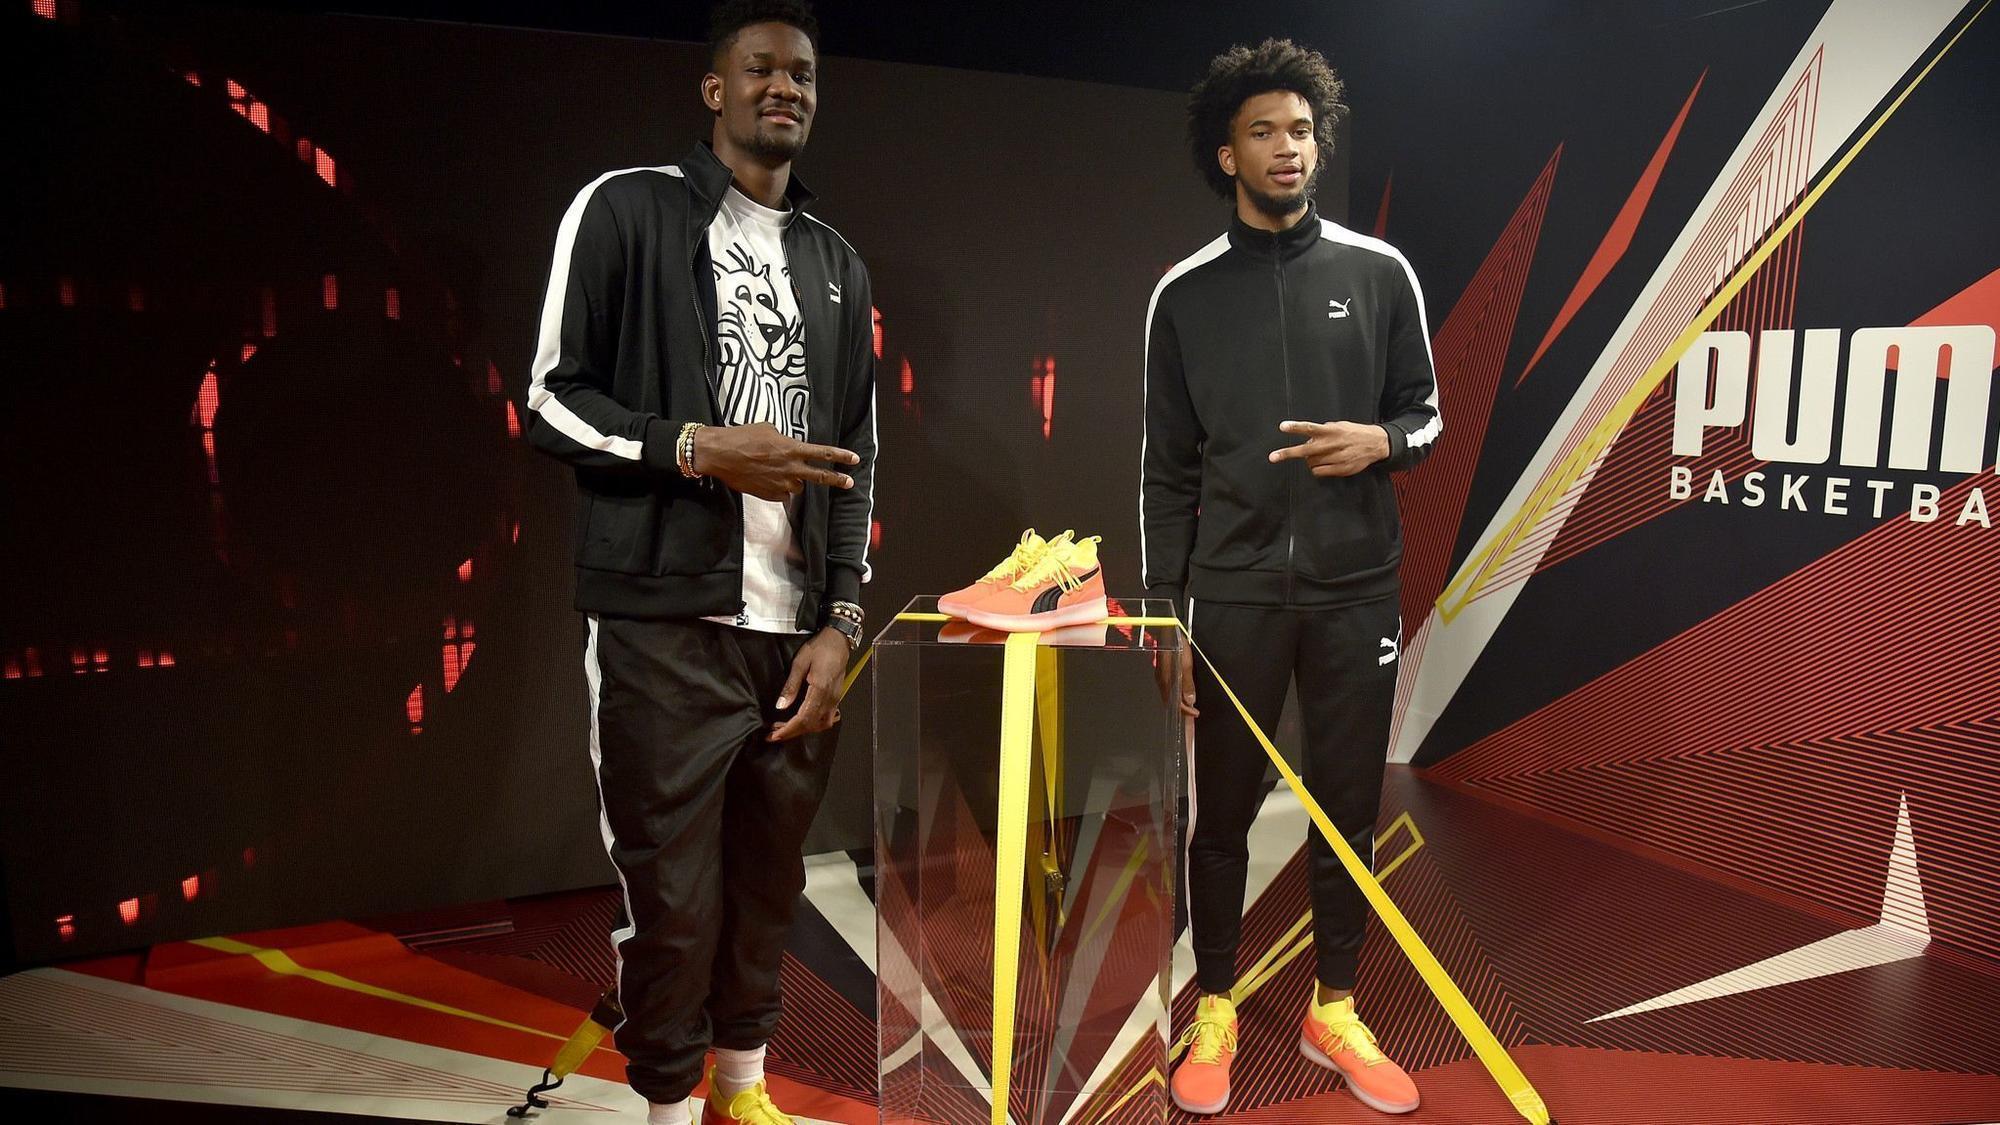 Sd-sp-basketball-puma-nike-adidas-sneakers-20180704